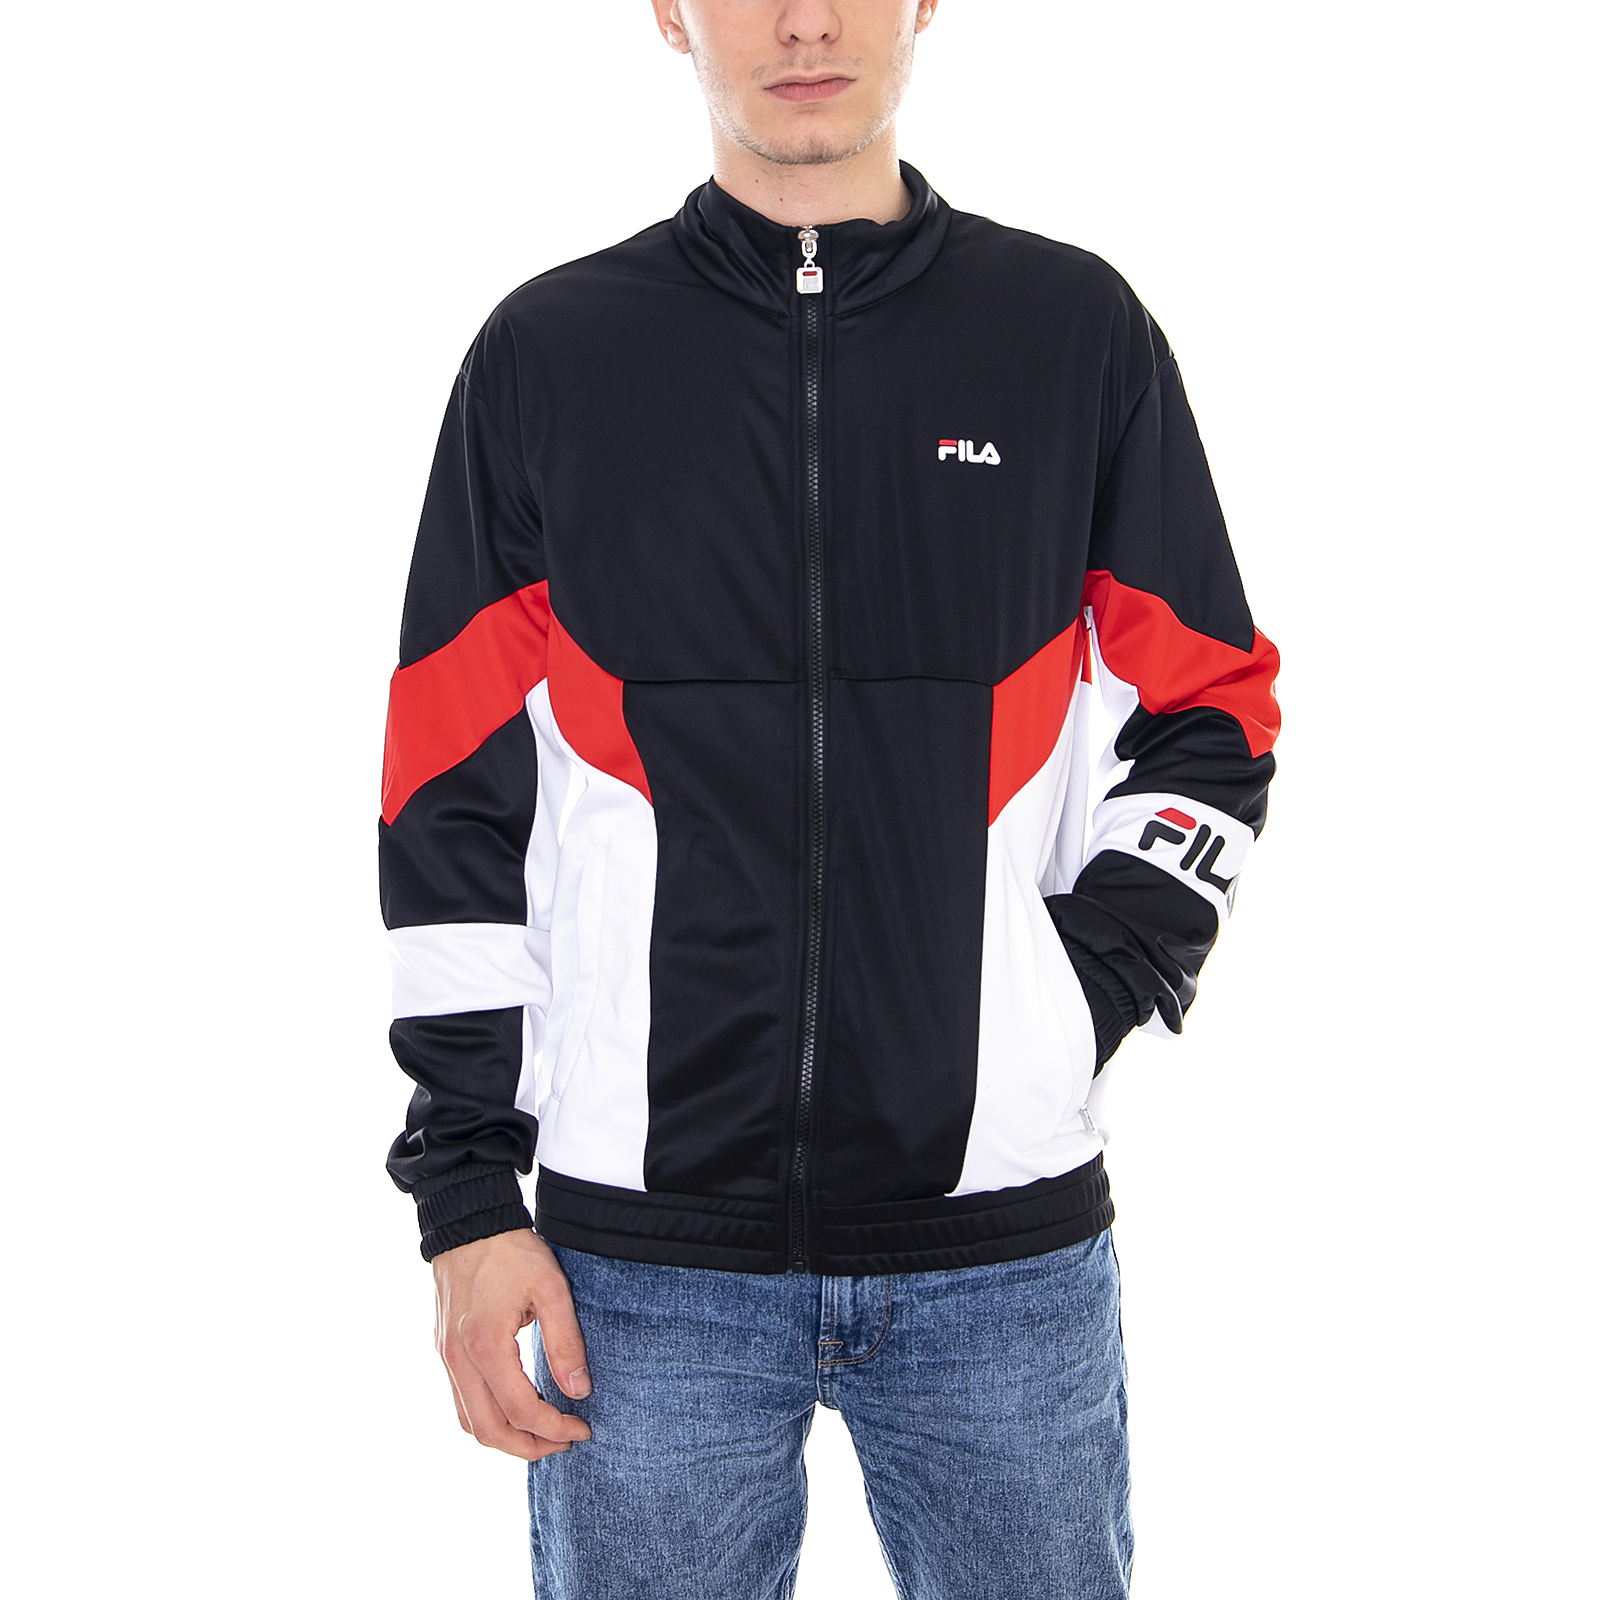 Vestes Fil Noir True Jacket Hommes White Track Red Rouge Bright Talbot PwdHqRarw